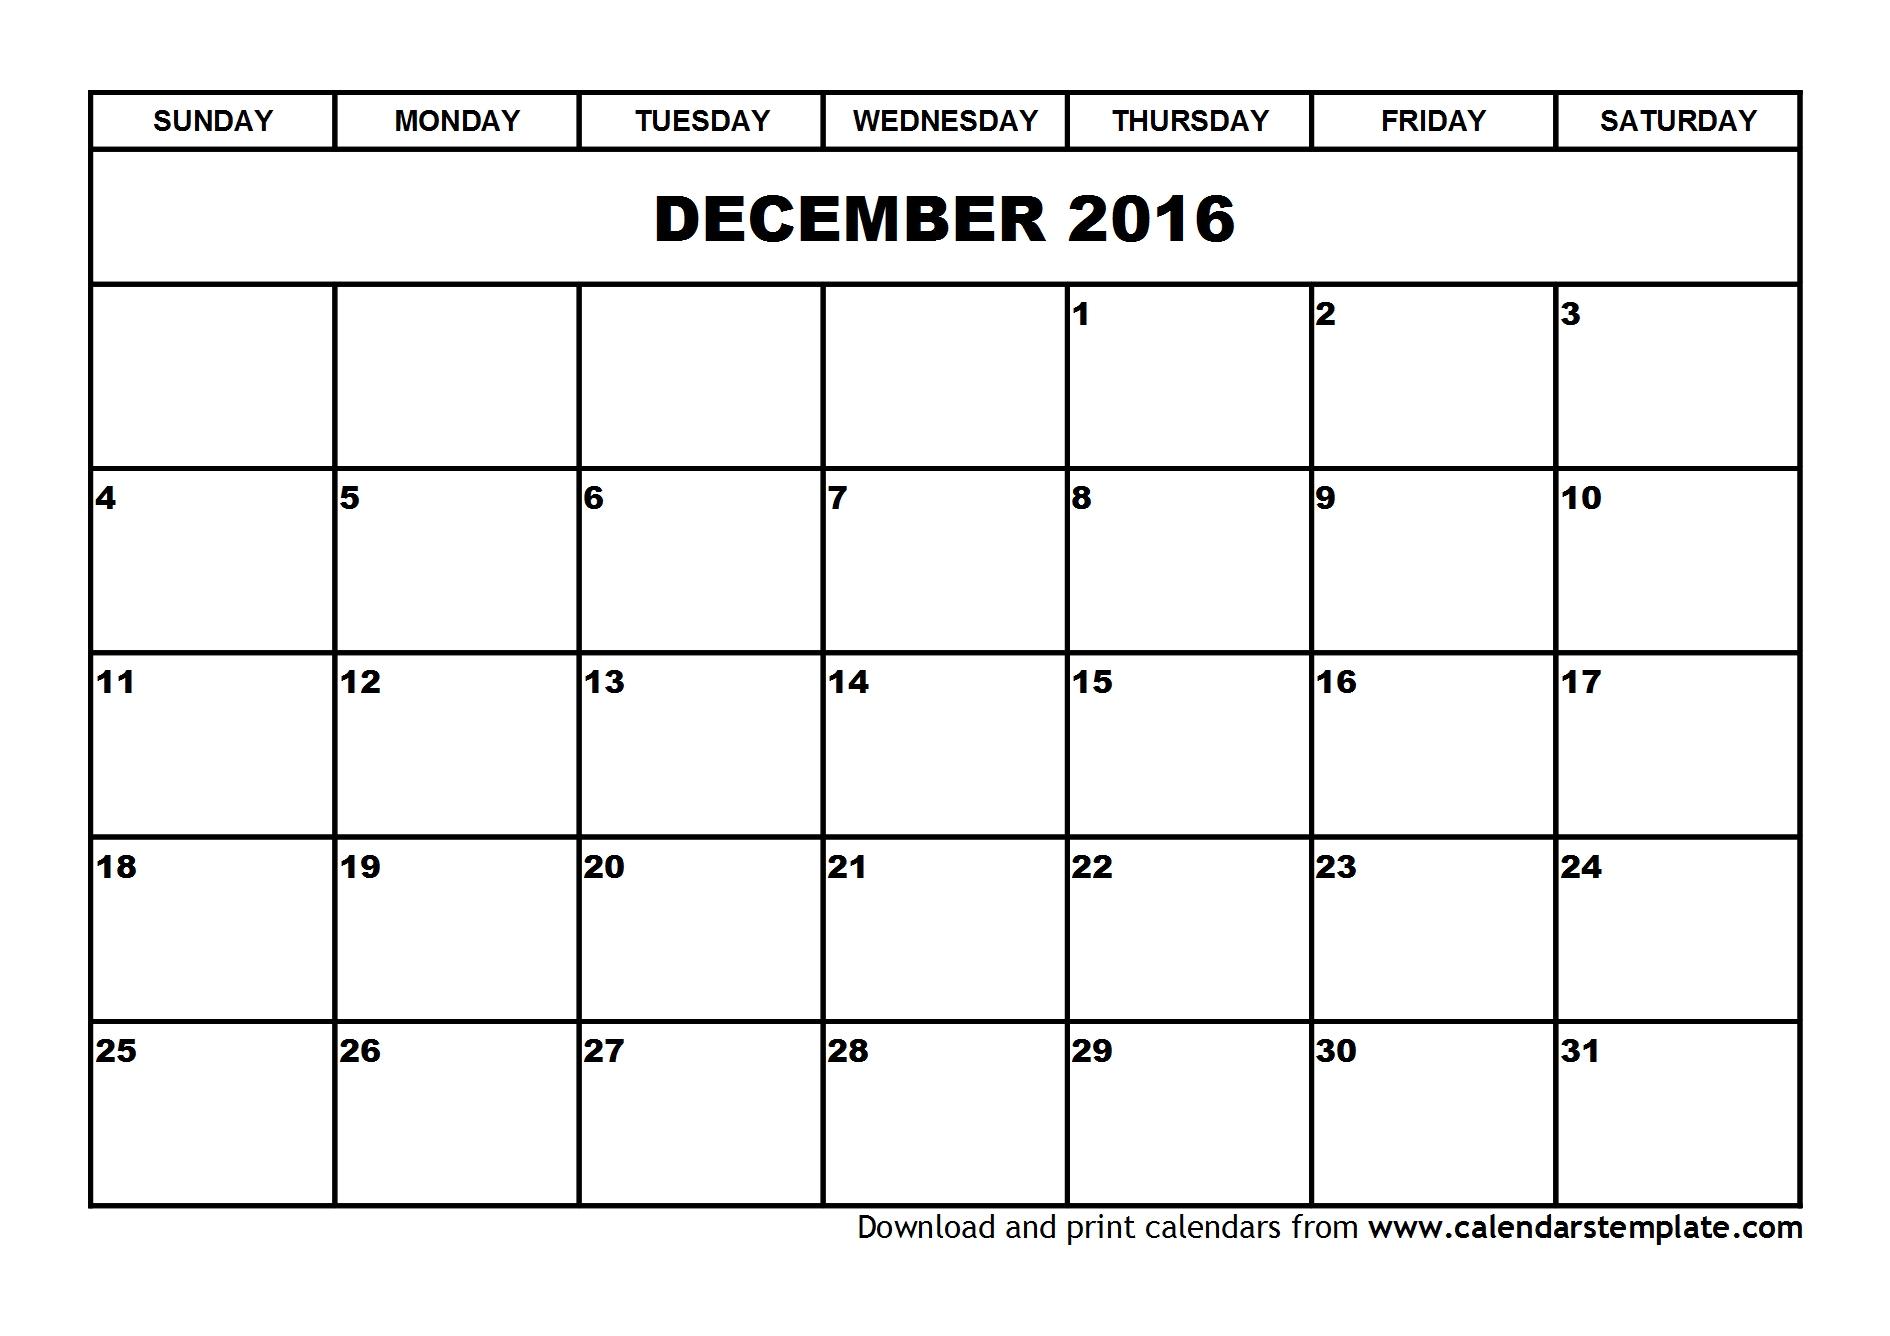 009 Blank Calendar Template Ideas November Printable December Pdf pertaining to Printable Blank Calendar For December